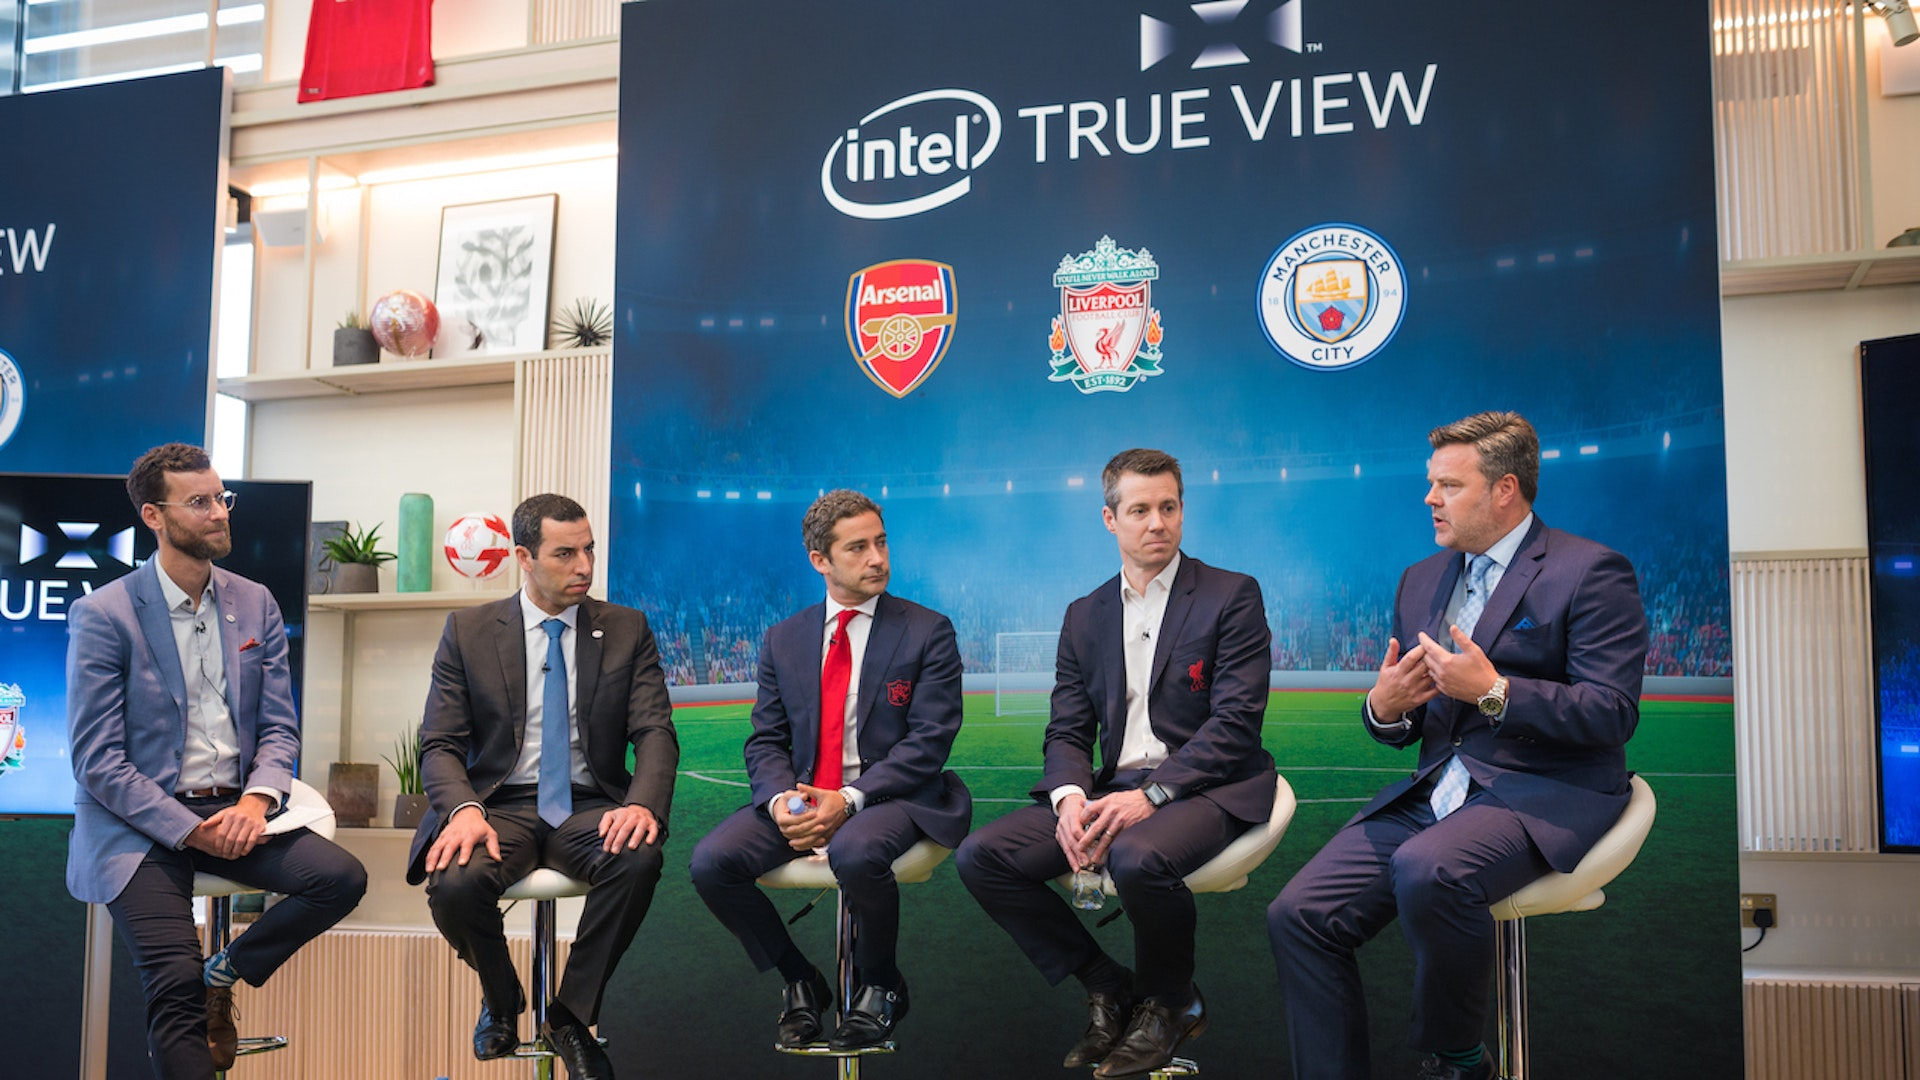 Premier League Clubs: Three Premier League Clubs To Use Intel 3D 360-degree